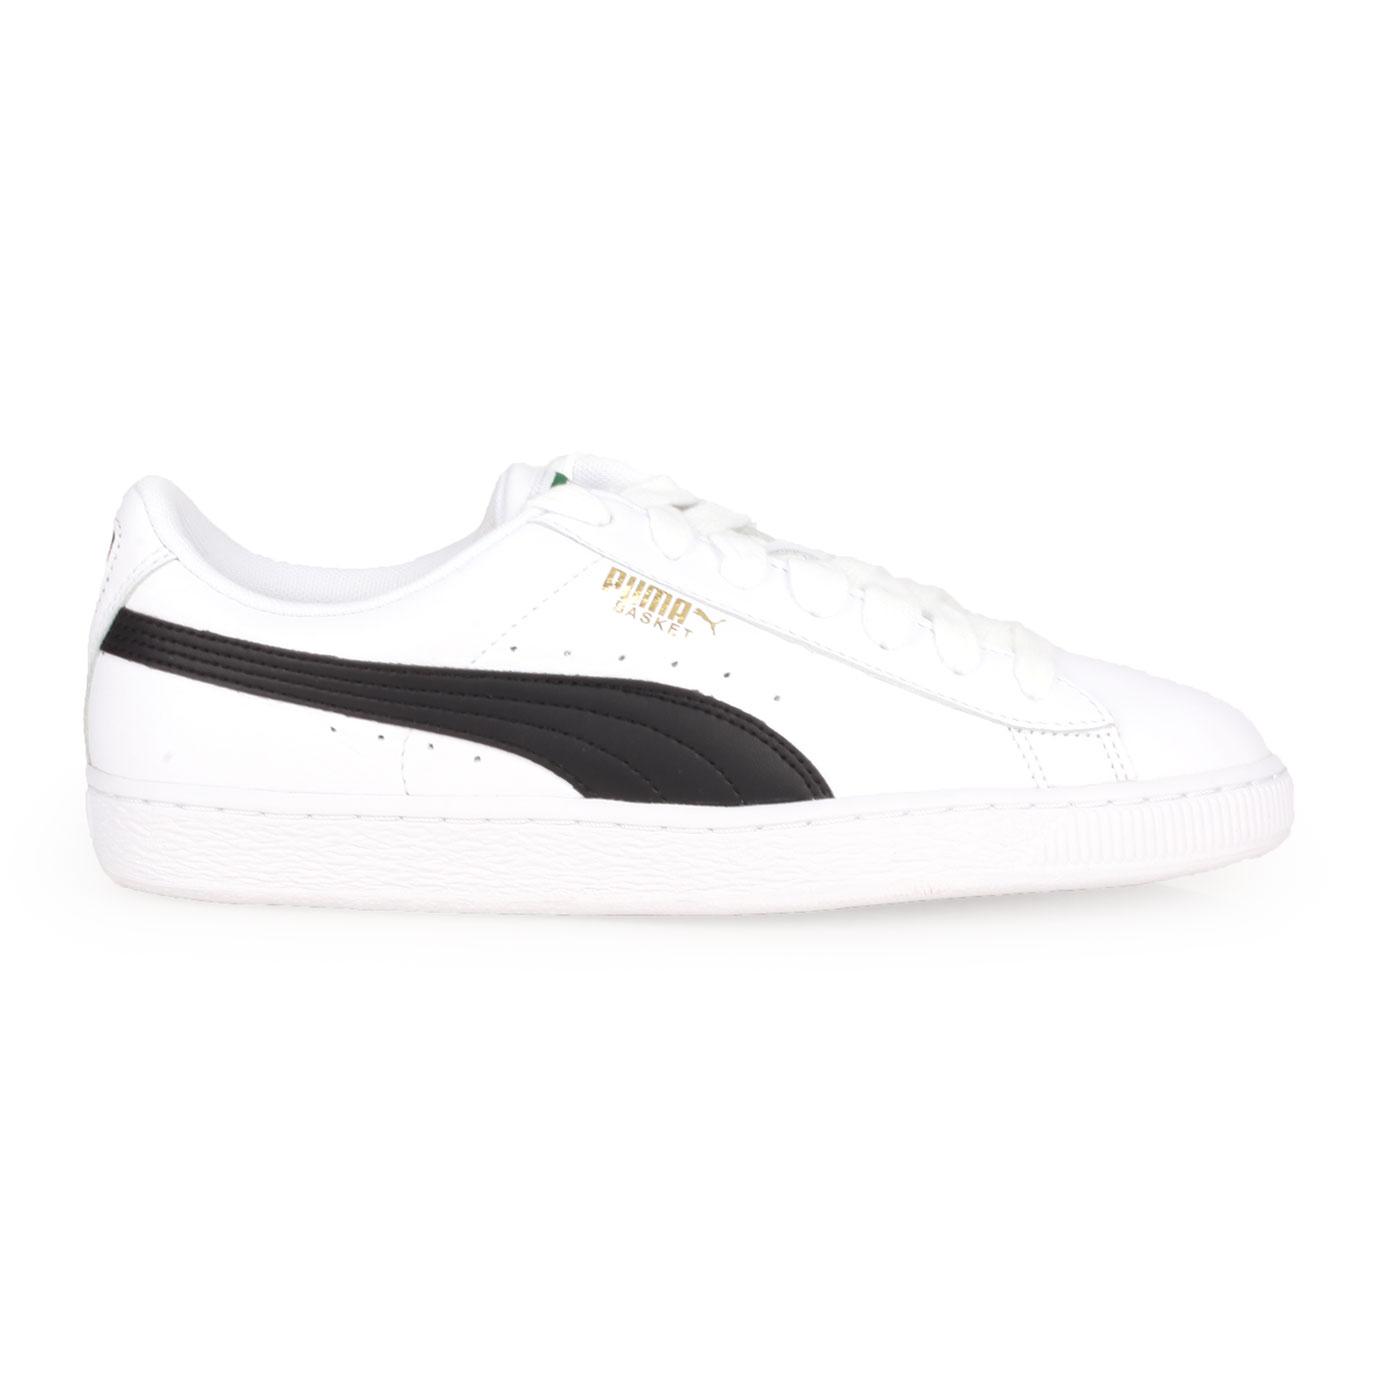 PUMA 經典復古休閒鞋  @BASKET CLASSIC LFS@35436717 - 白黑